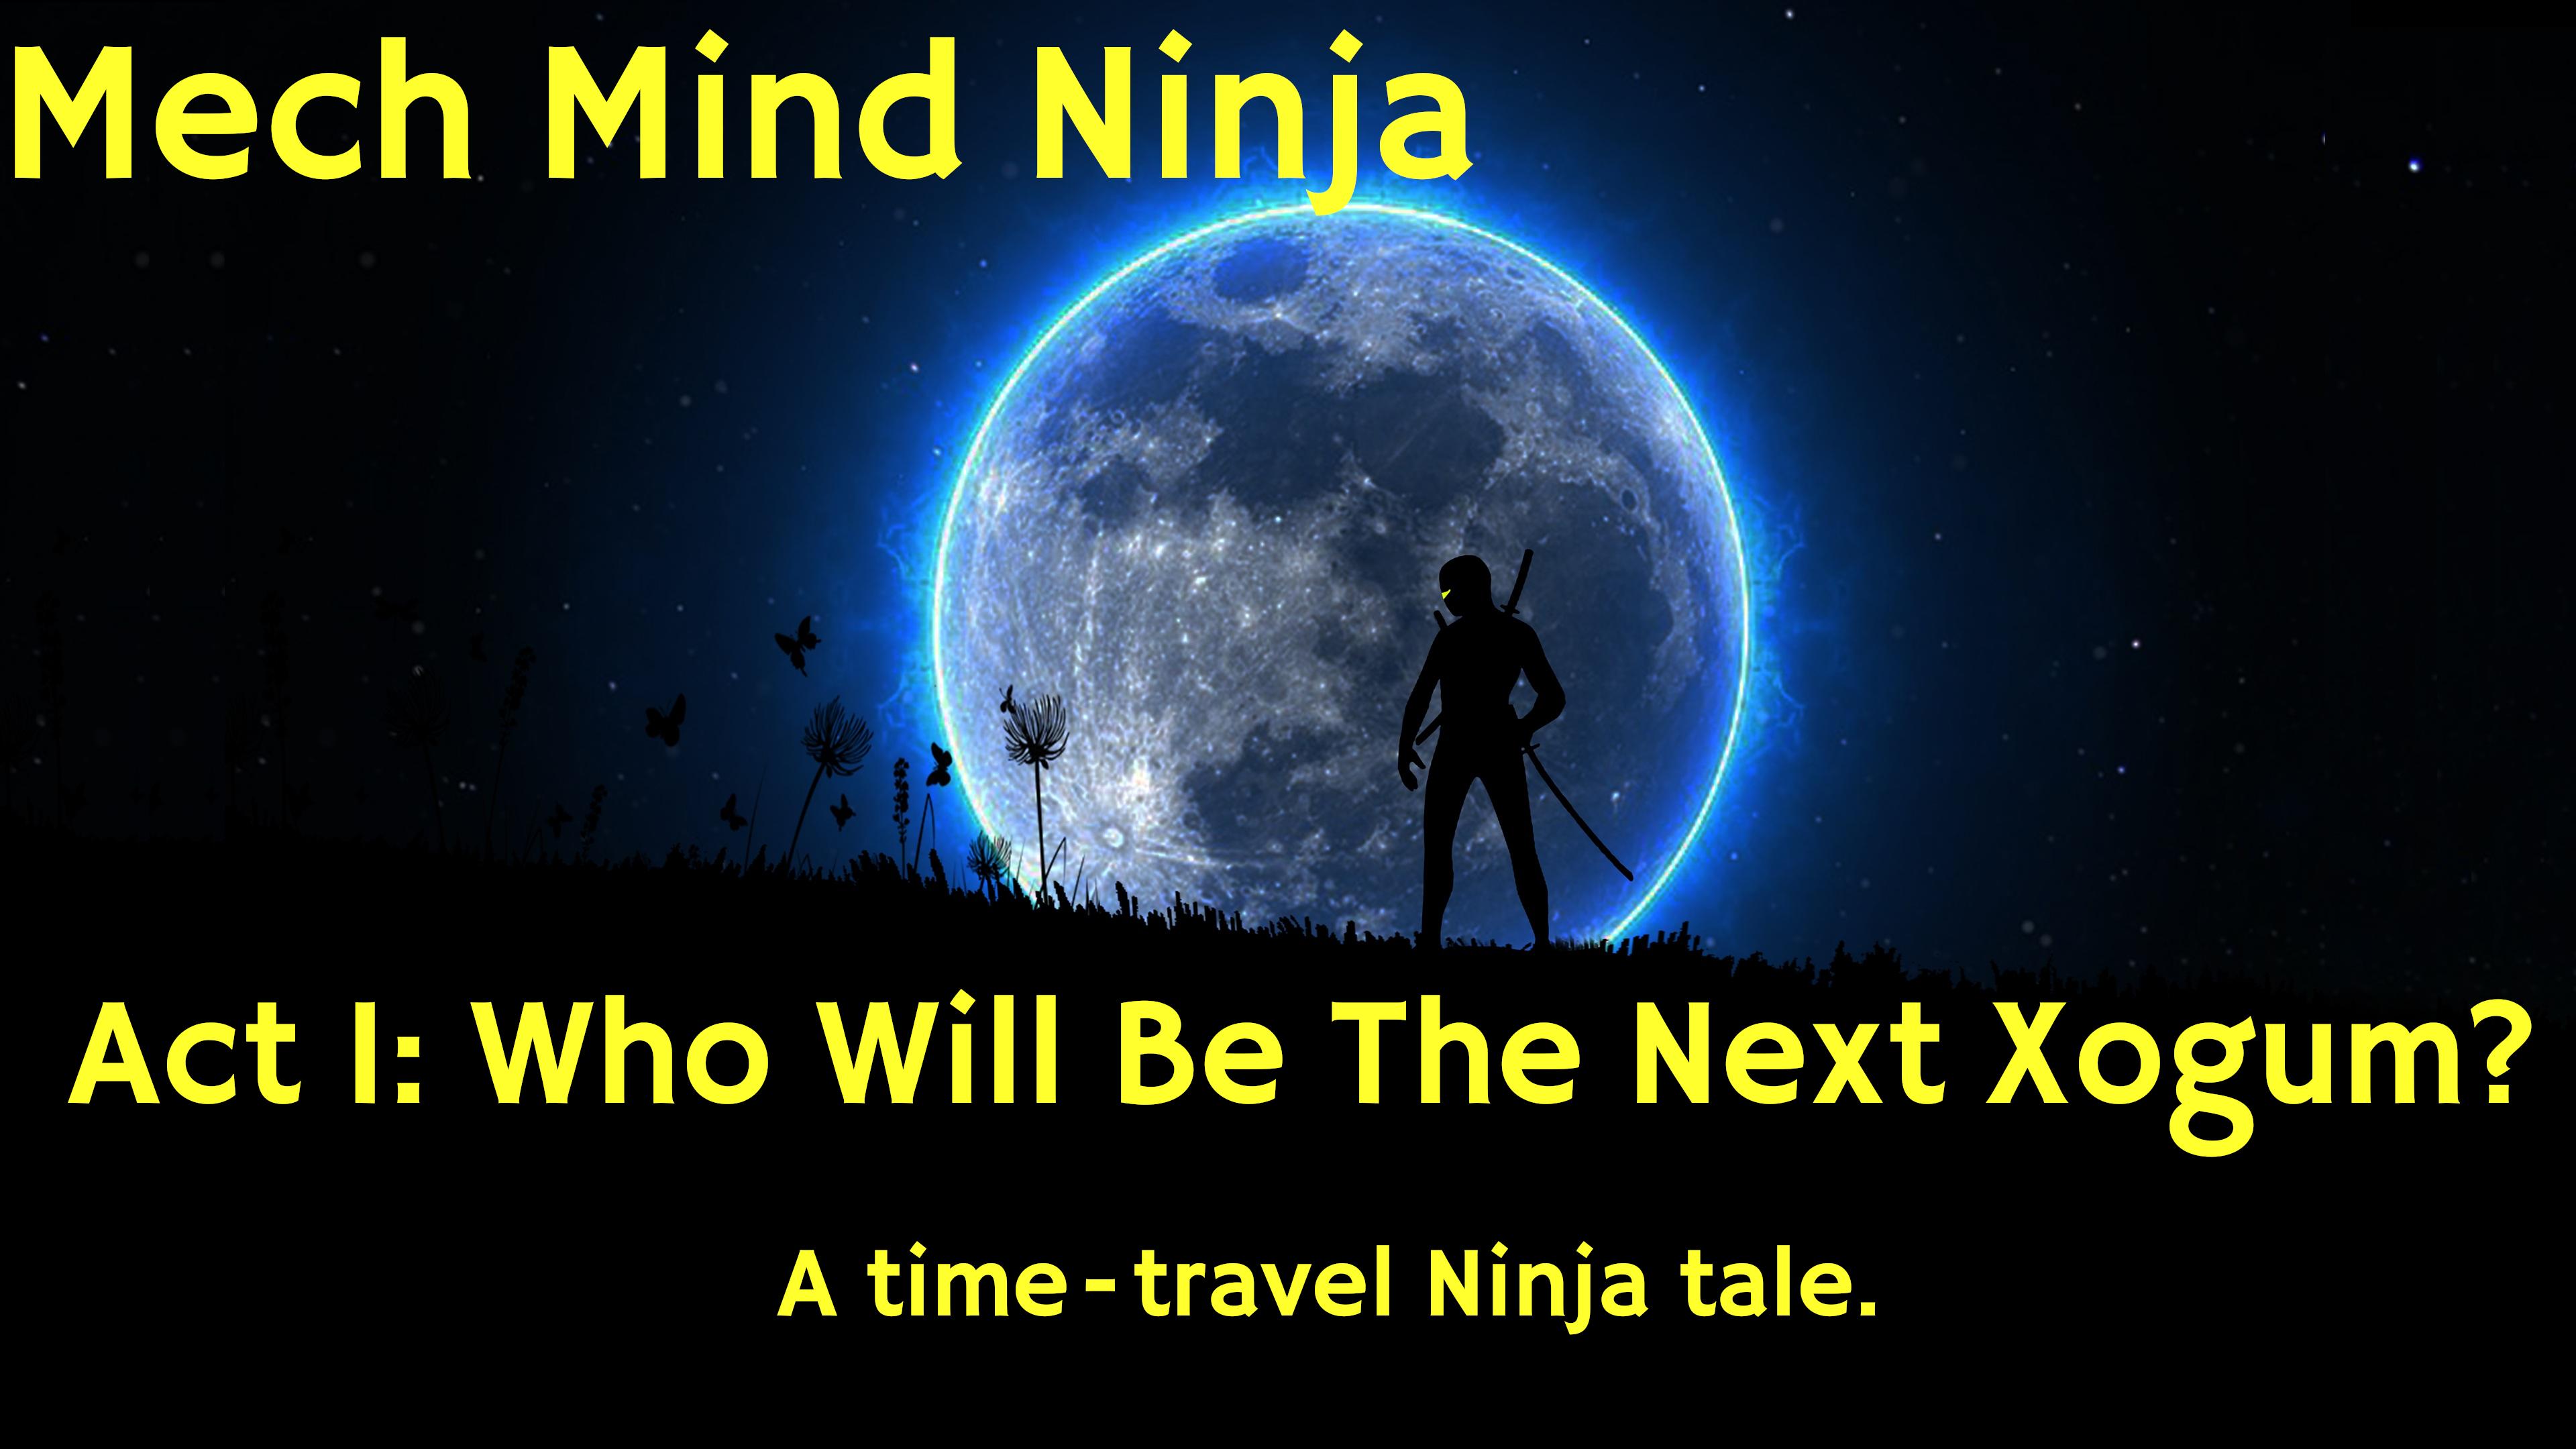 Act I: Who Will Be The Next Shogun?